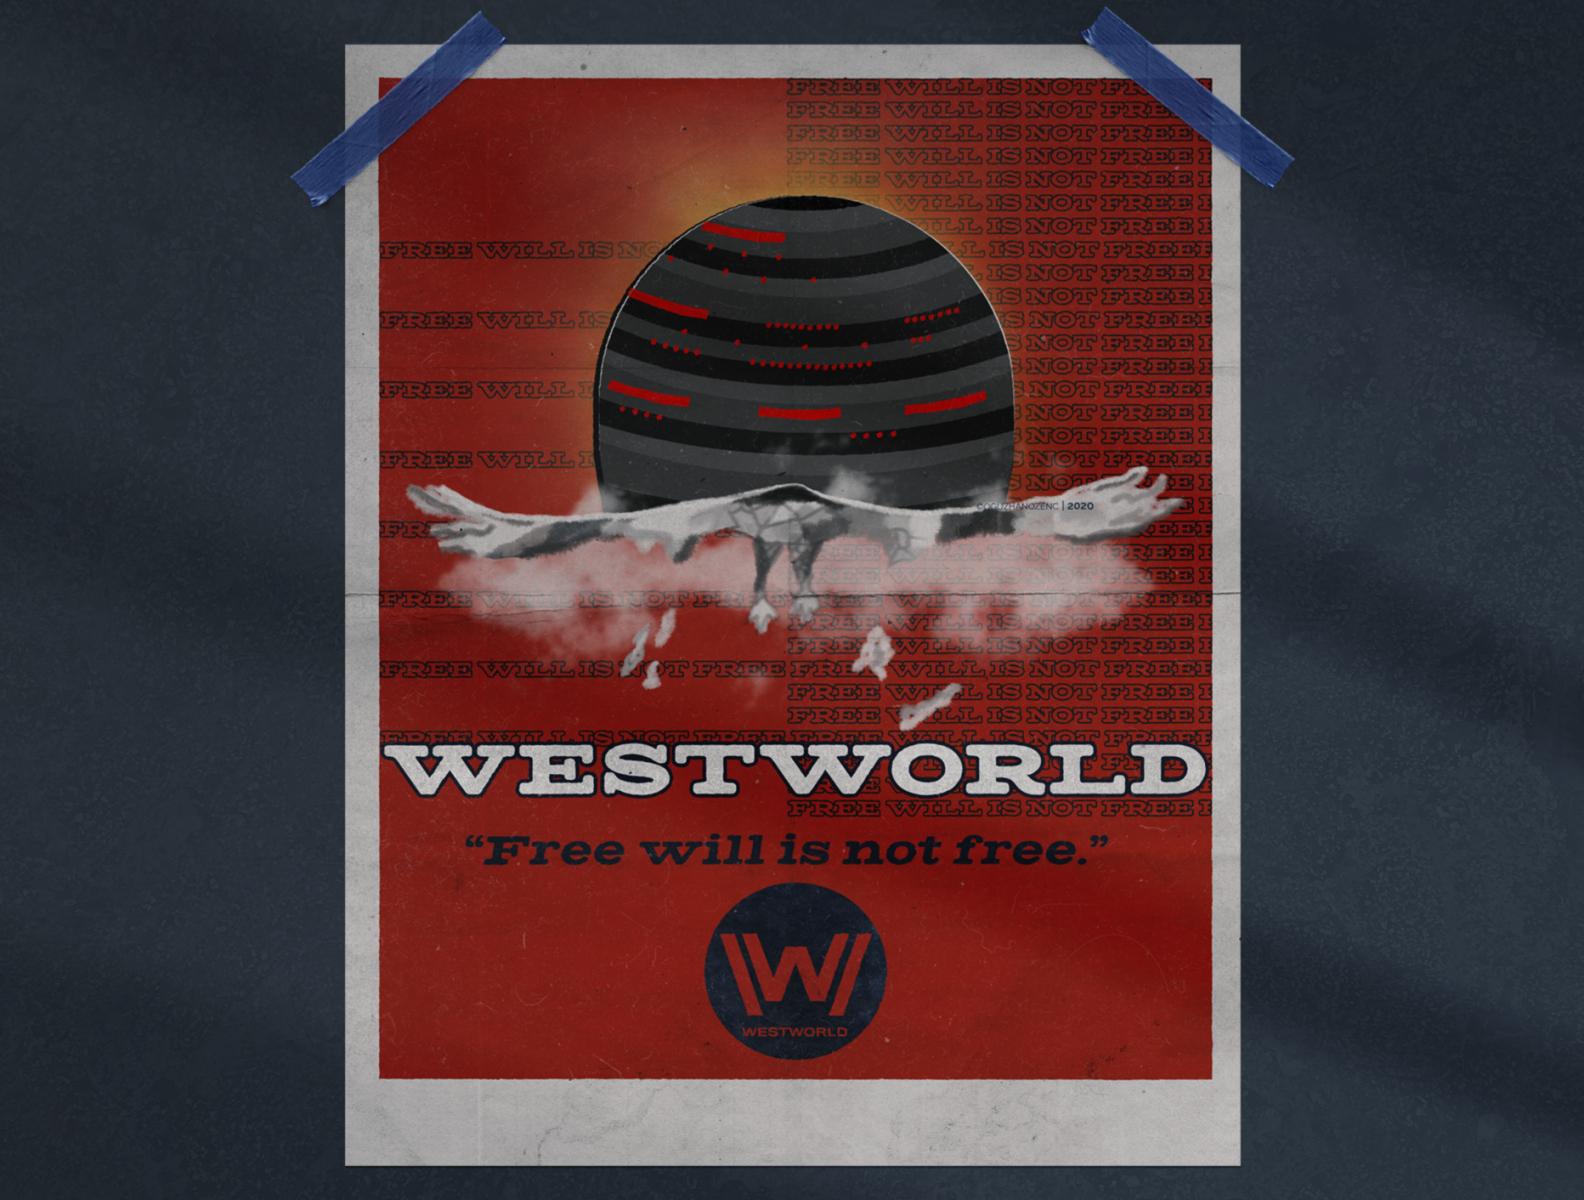 westworld season 3 poster concept